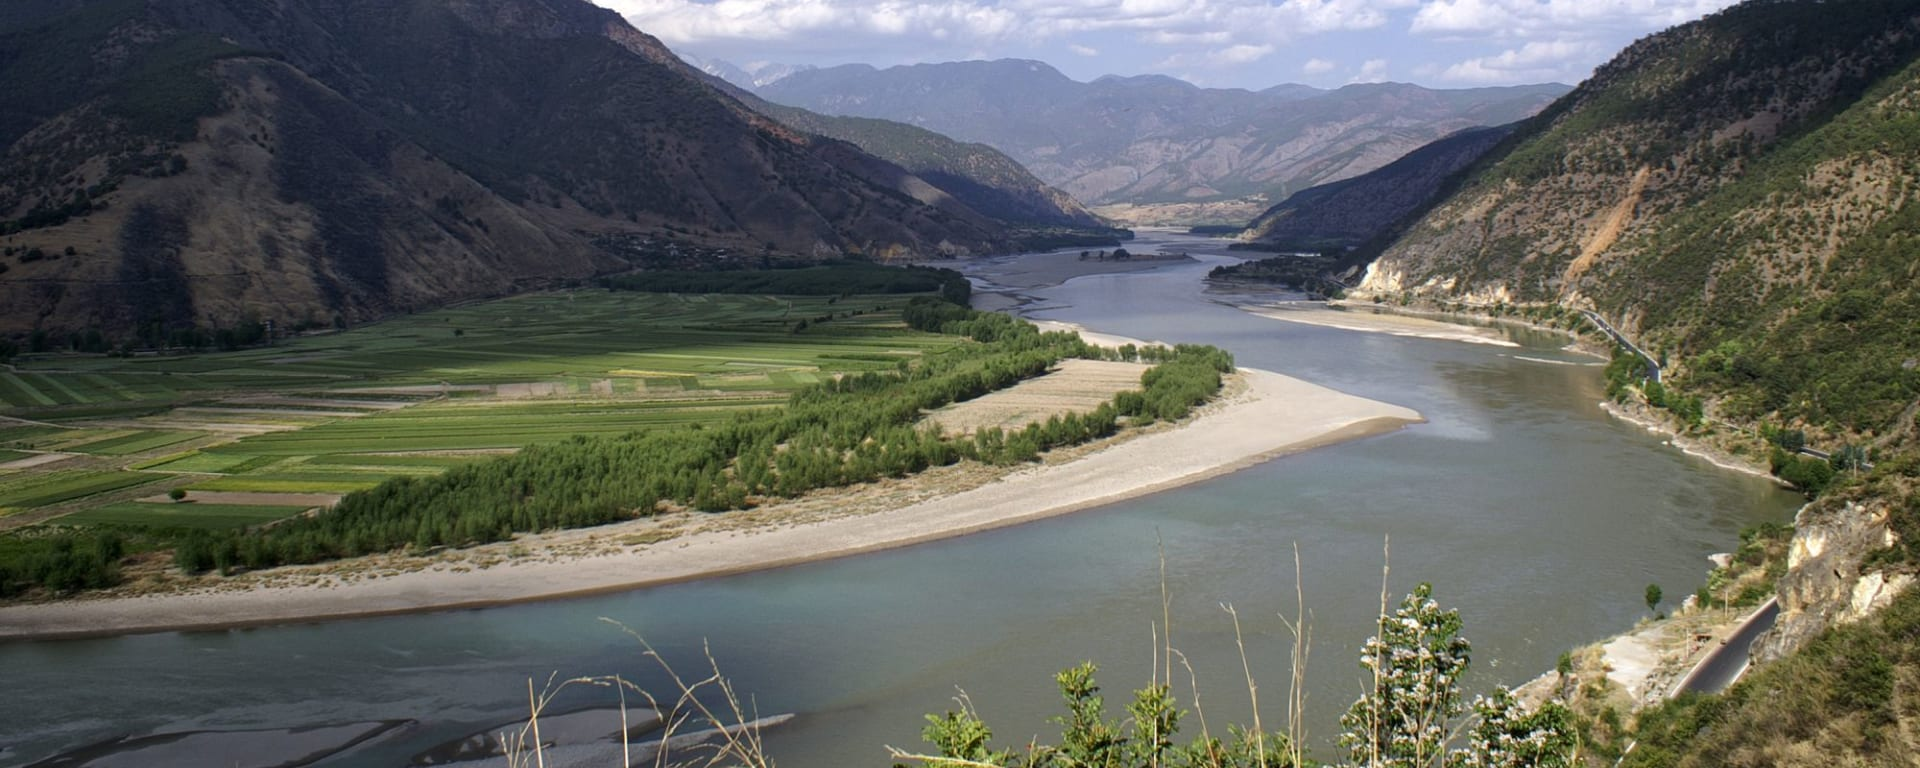 Circuit spectaculaire du Yunnan au Tibet de Kunming: Bend of Yangtze River in Shigu 002